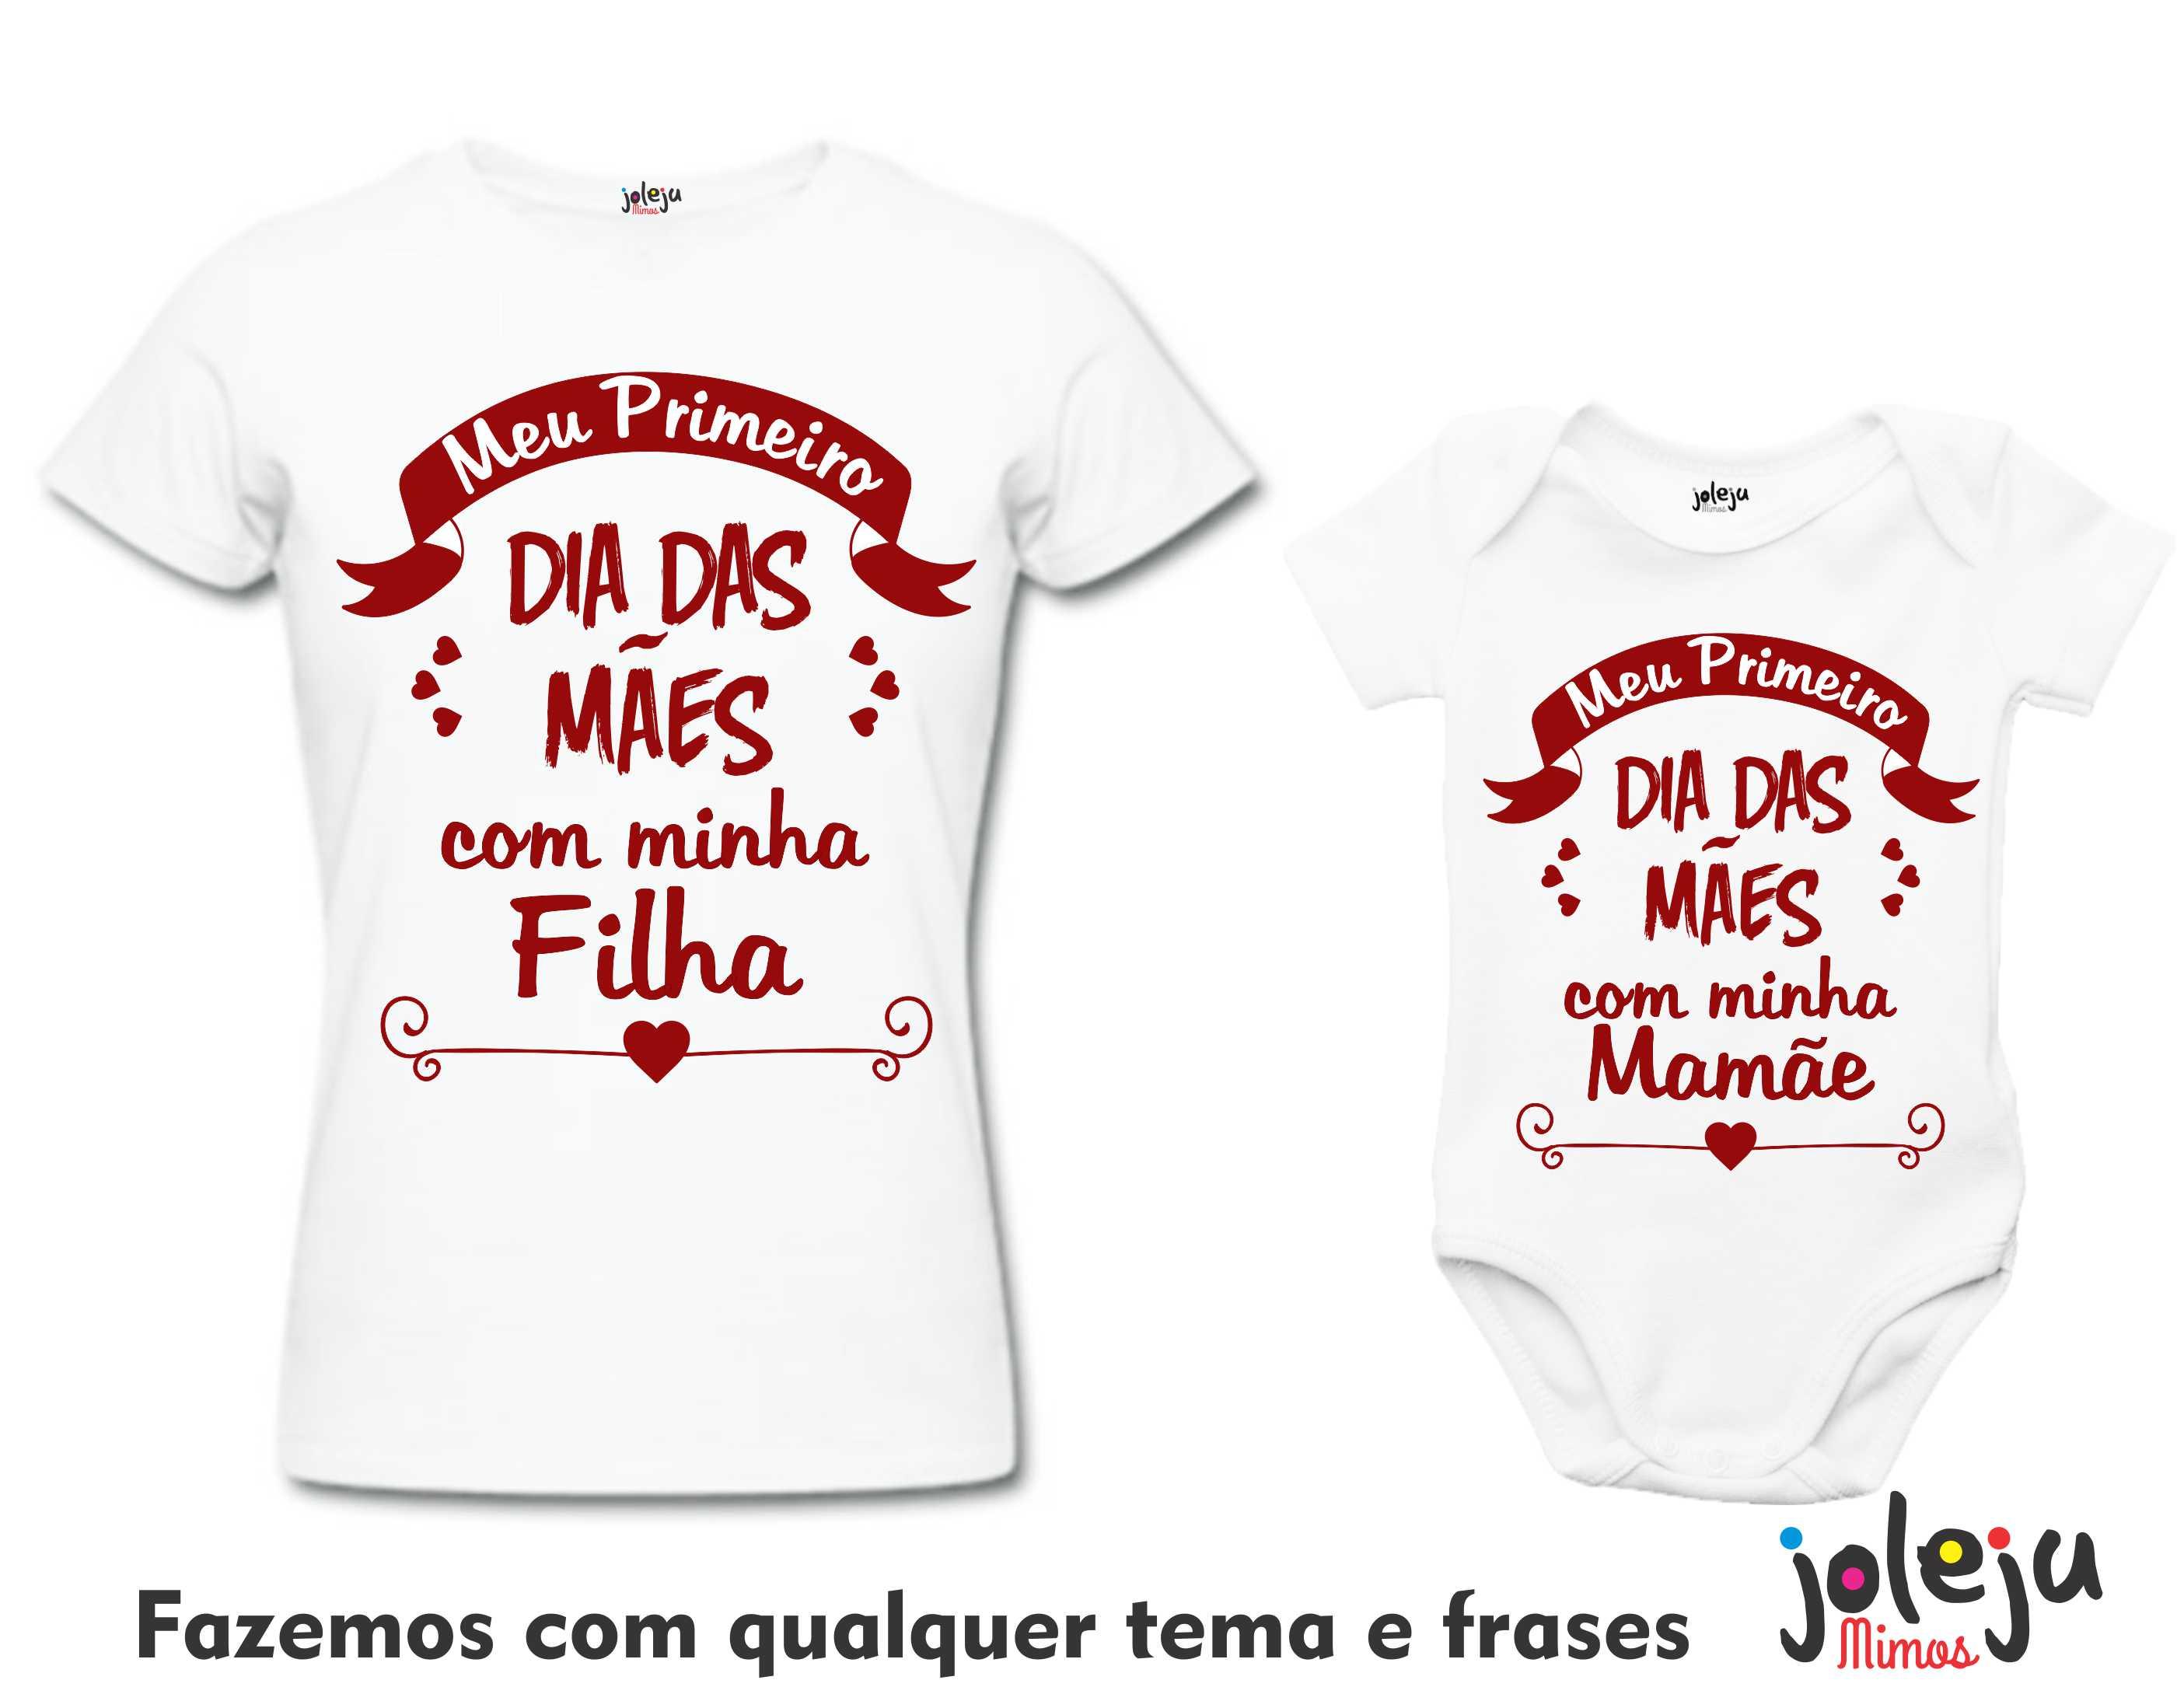 Kit Camisetas Coleção De Joleju Camisetas At 2aa633 Elo7